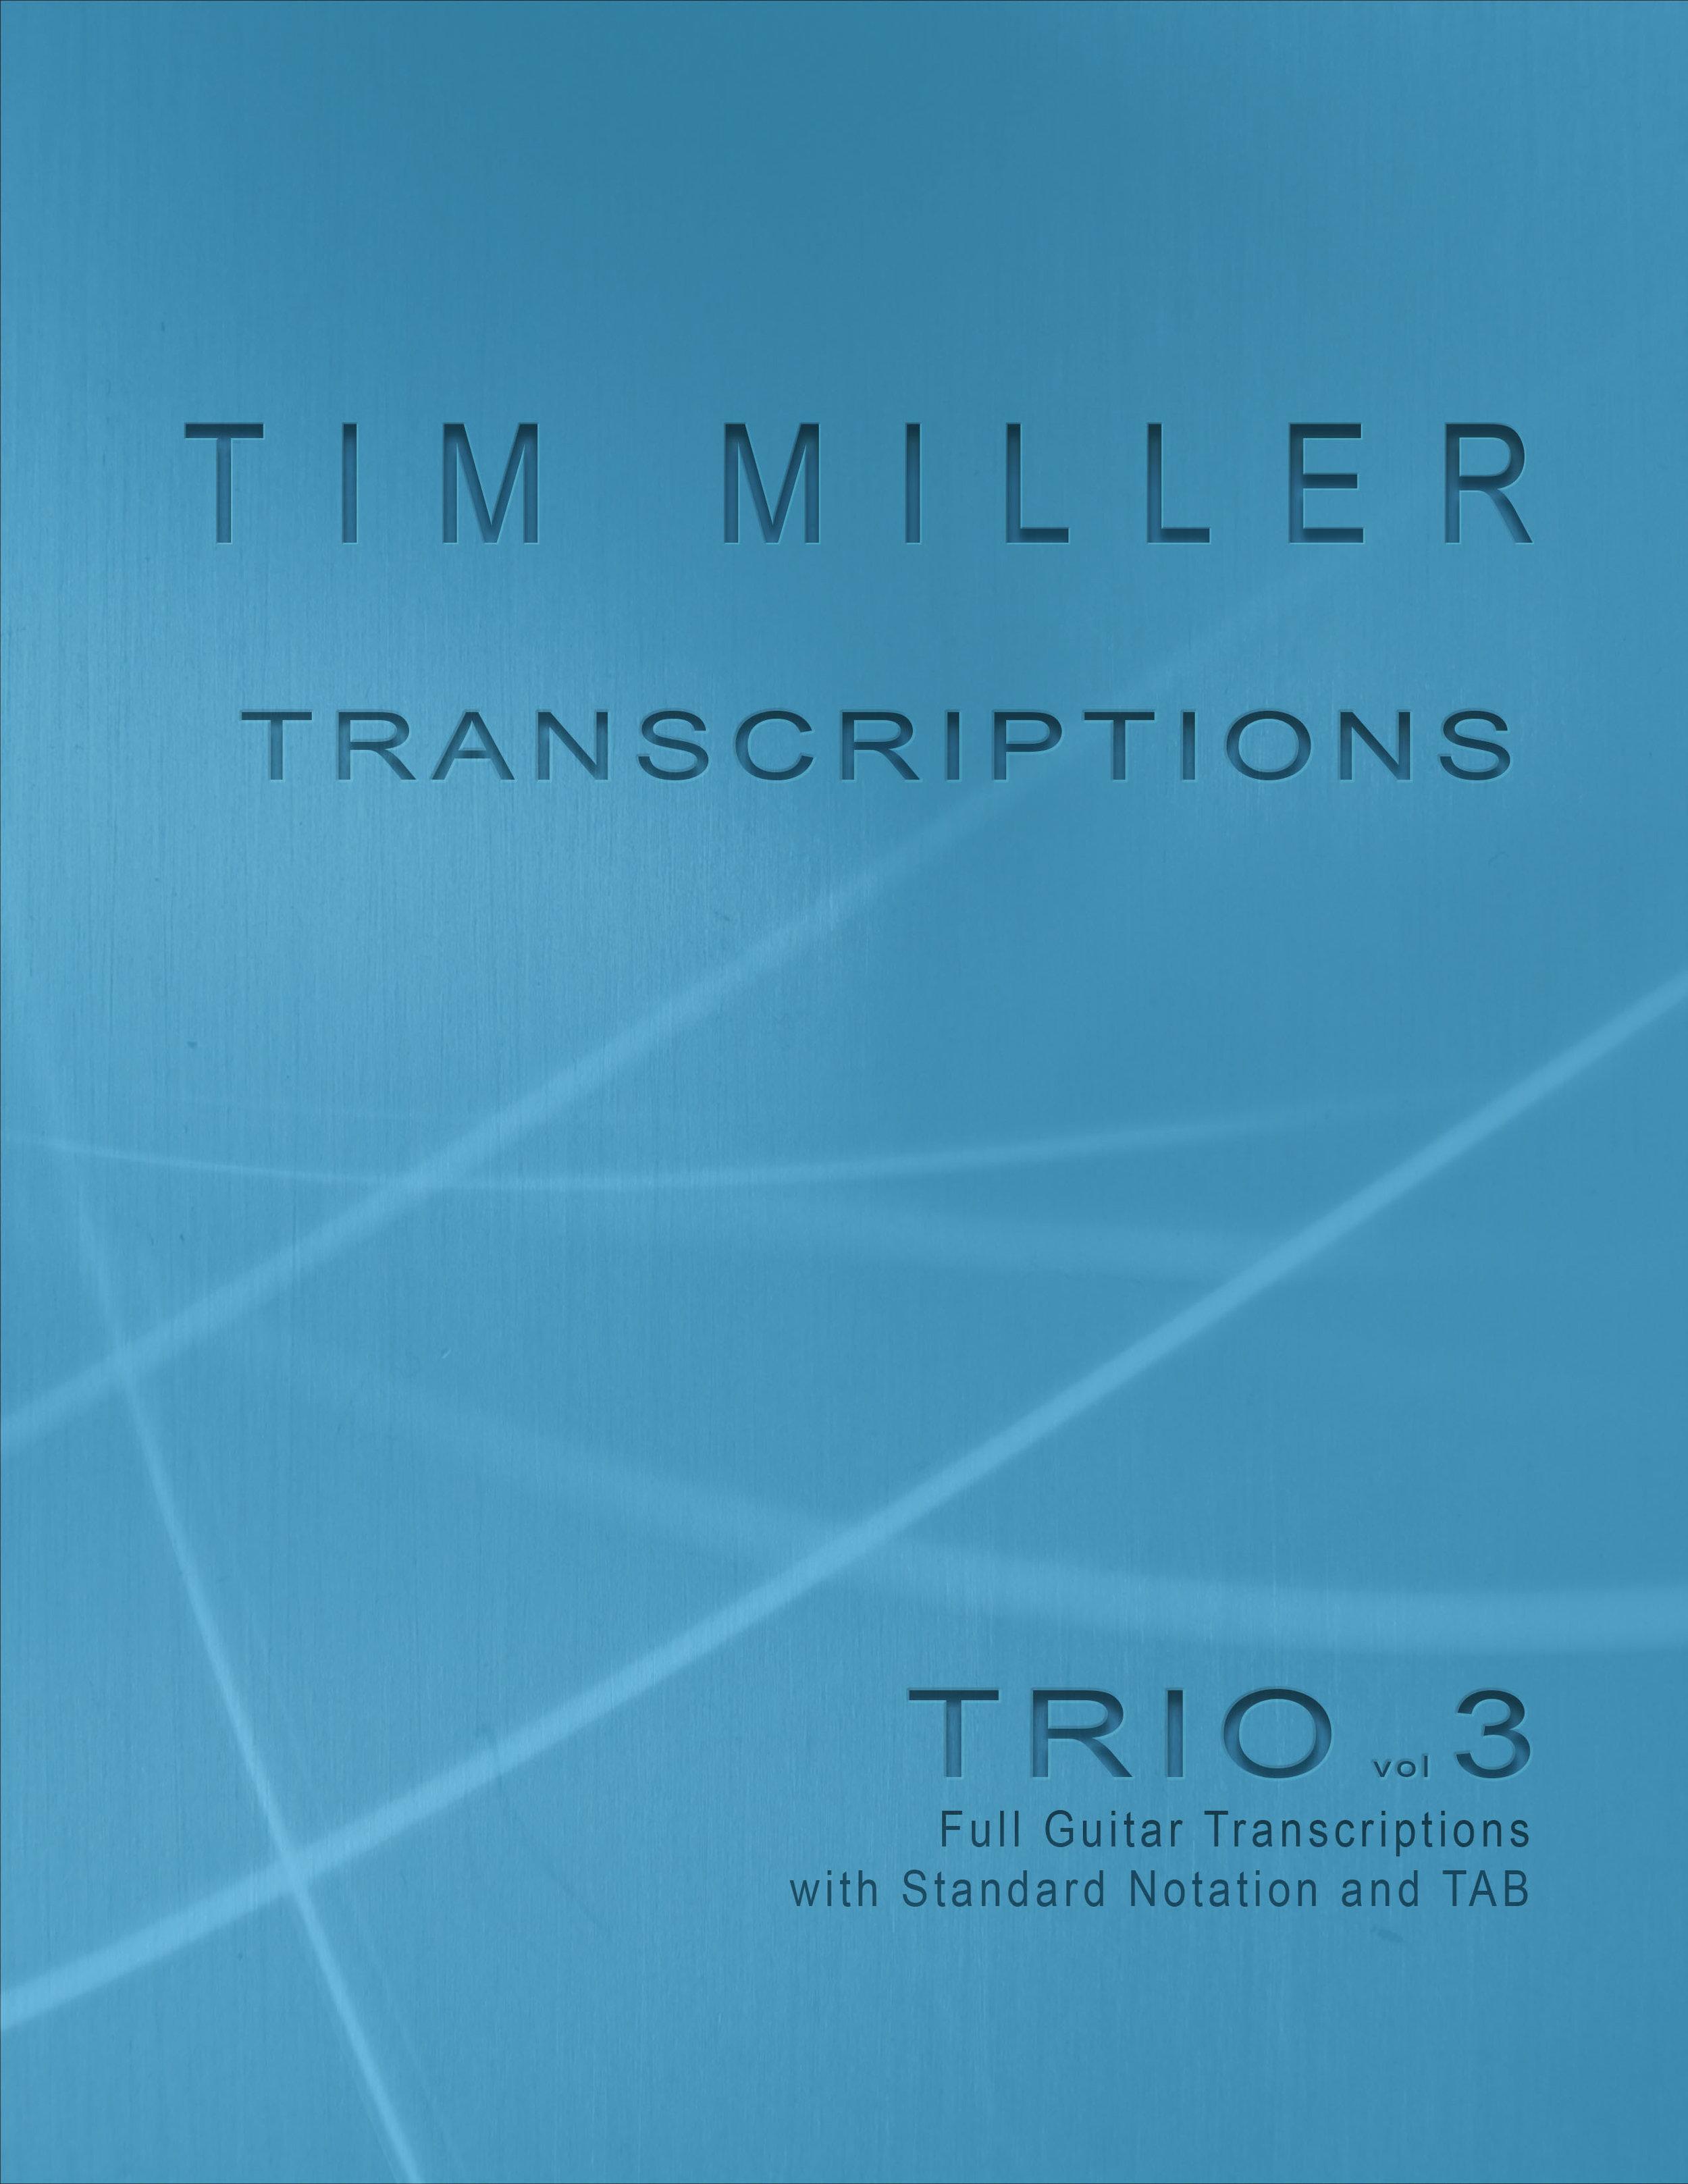 Tim Miller Trio vol 3 Transcriptions Front Cover.jpg